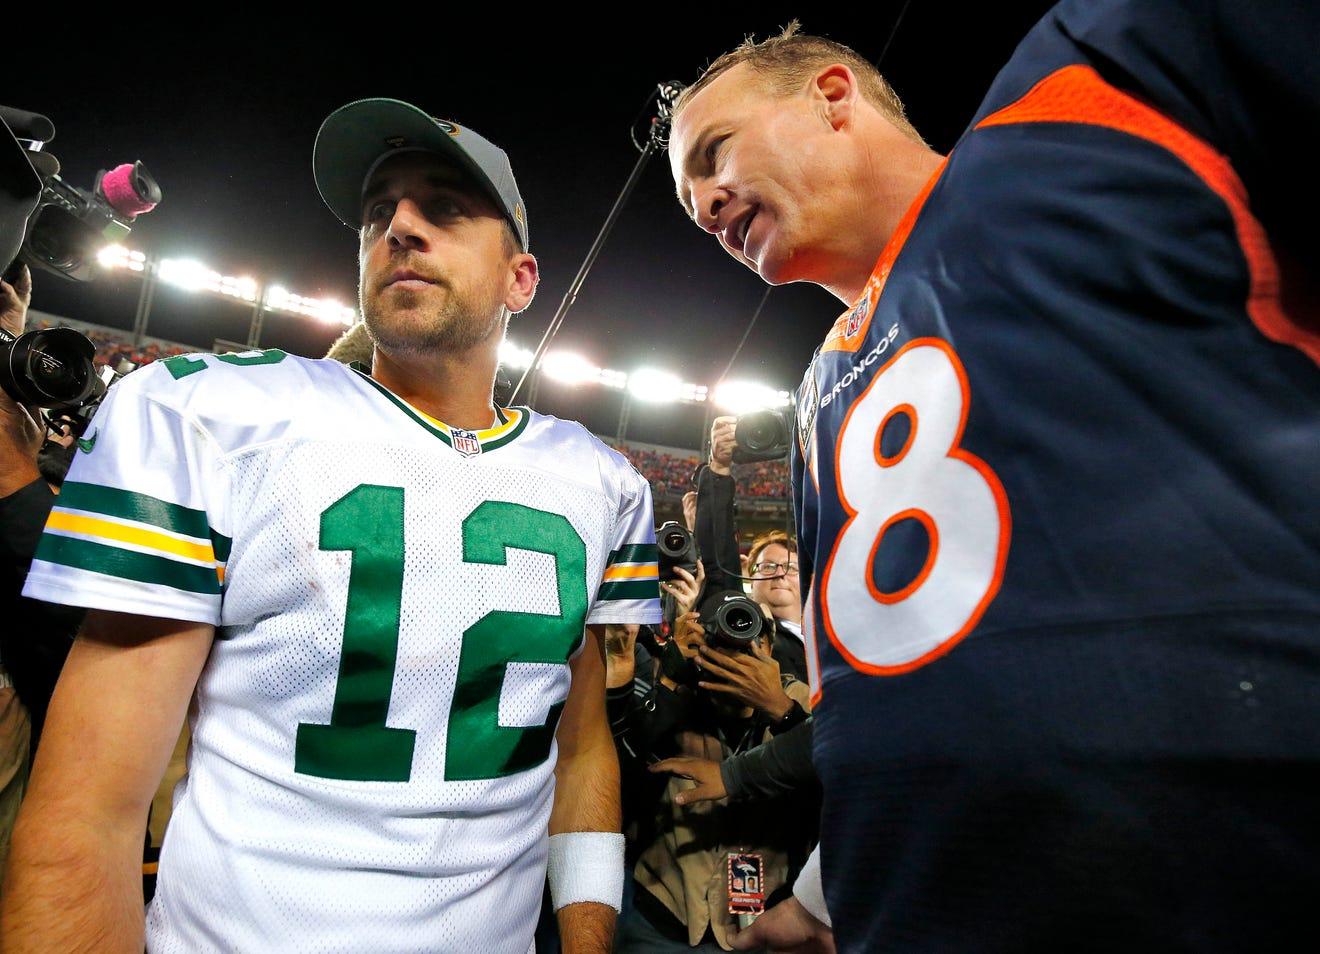 Peyton Manning & Eli Manning Show Off Rap Skills in